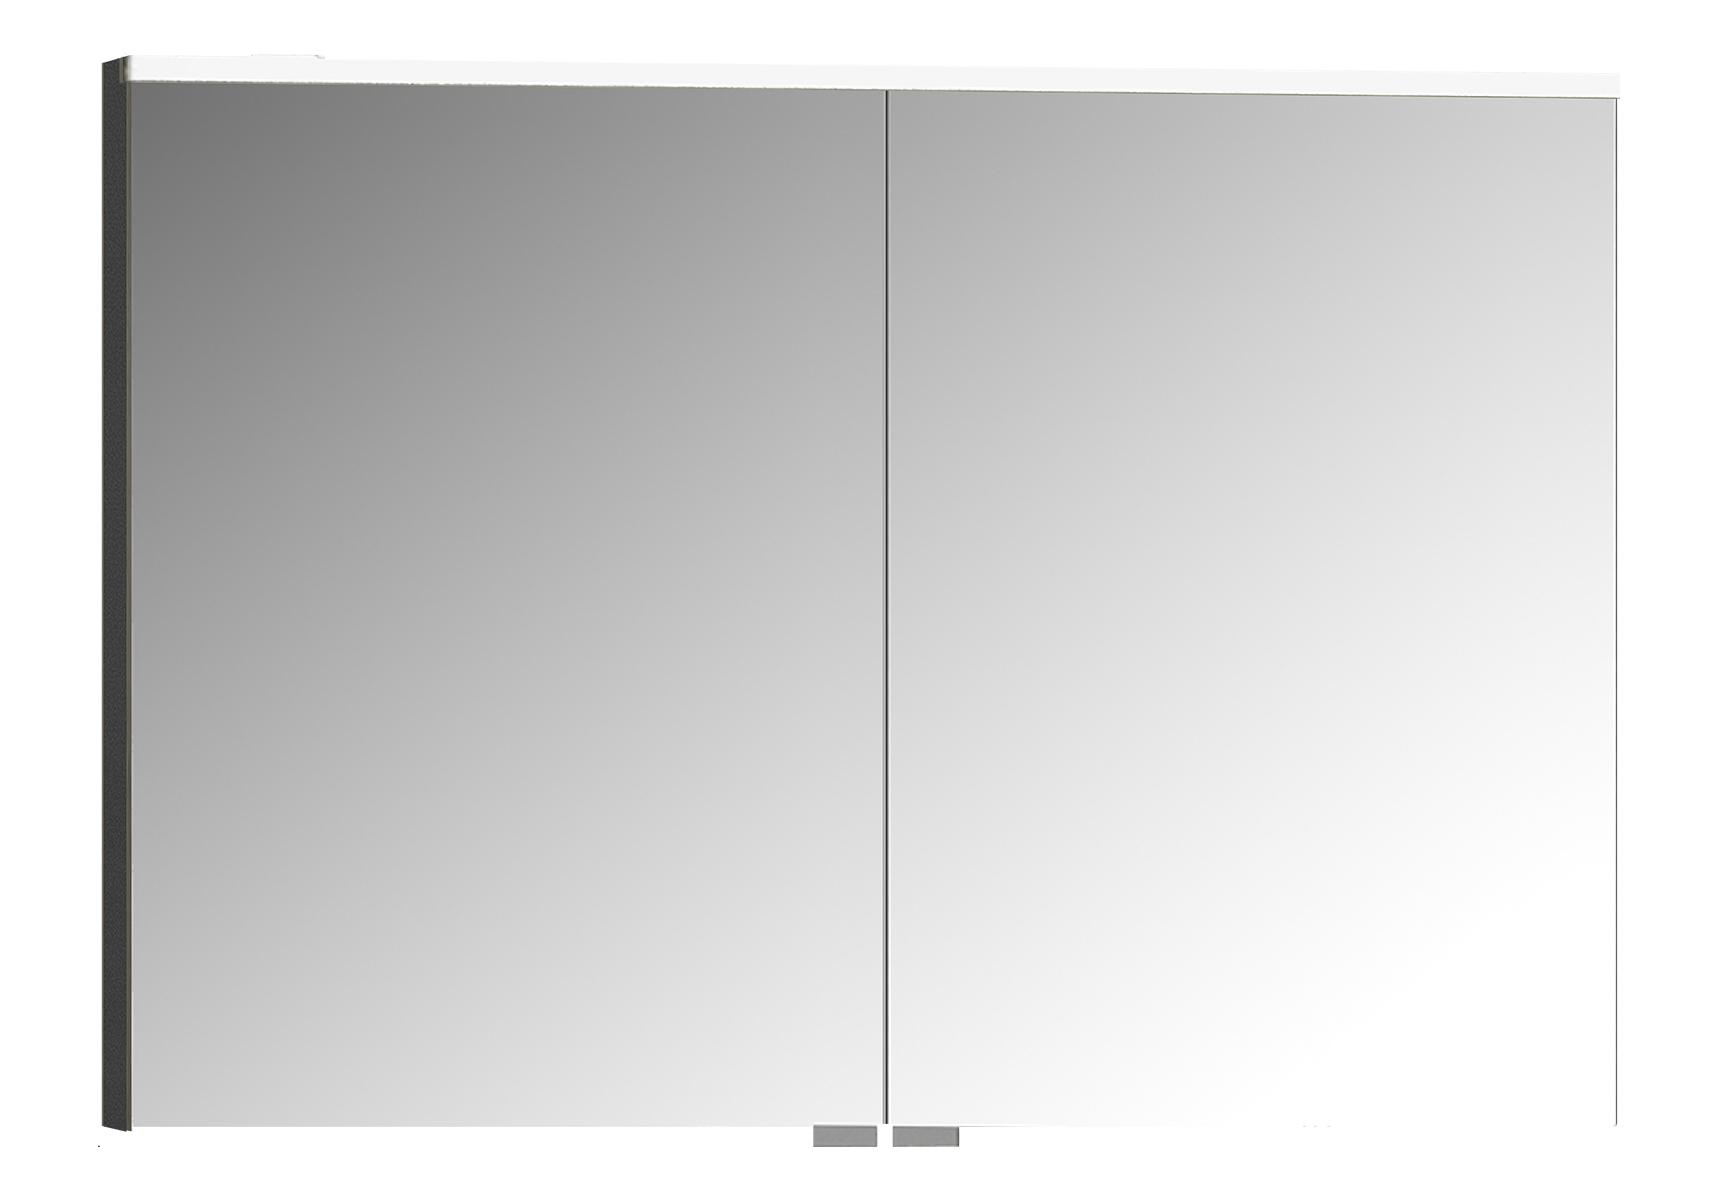 Integra Premiumarmoire de toilette, 100 cm, éclairage LED horizontale,anthraciteacite haute brilliance, 2 portes